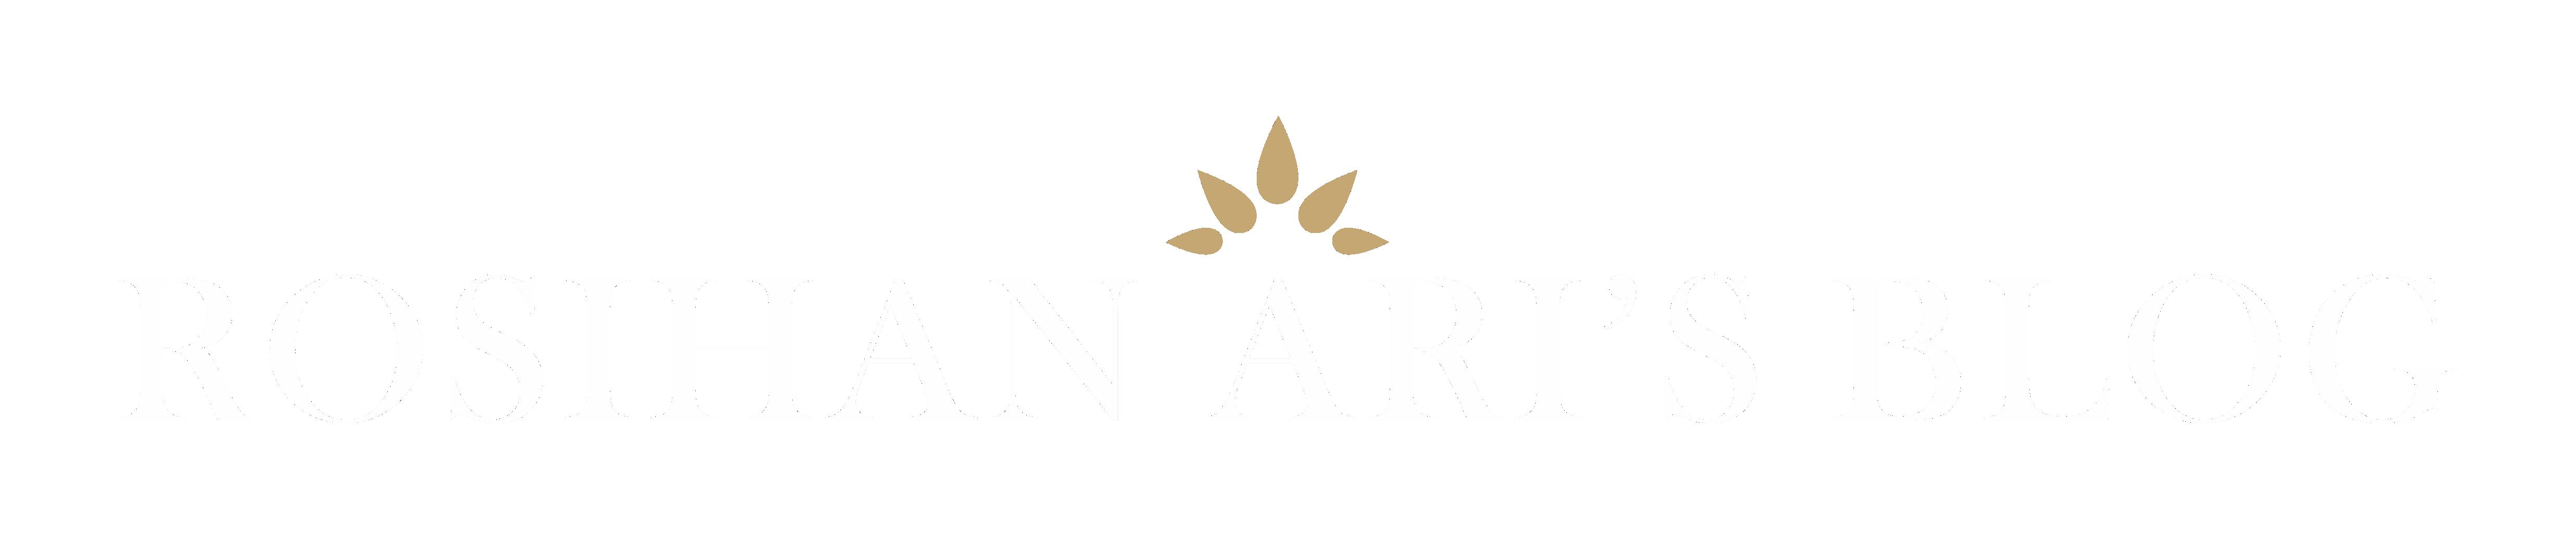 Rosihan Ari's Blog